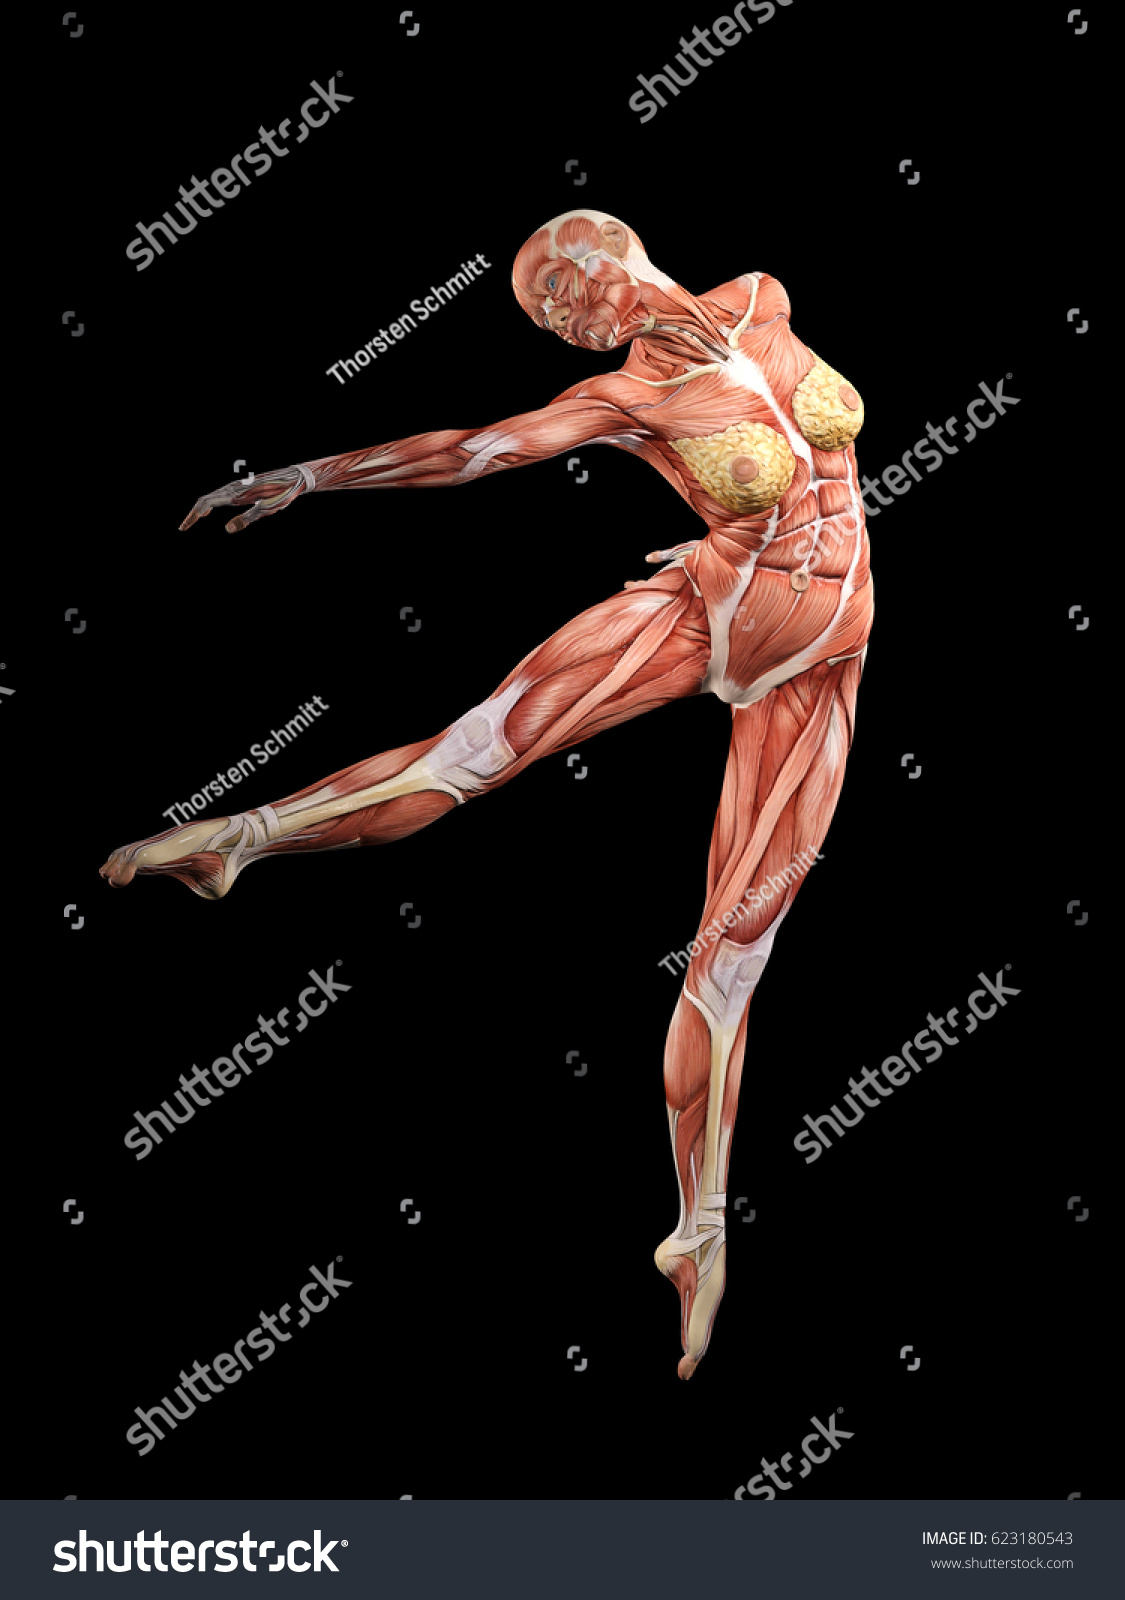 Ballet Anatomy Diagram - Electrical Drawing Wiring Diagram •